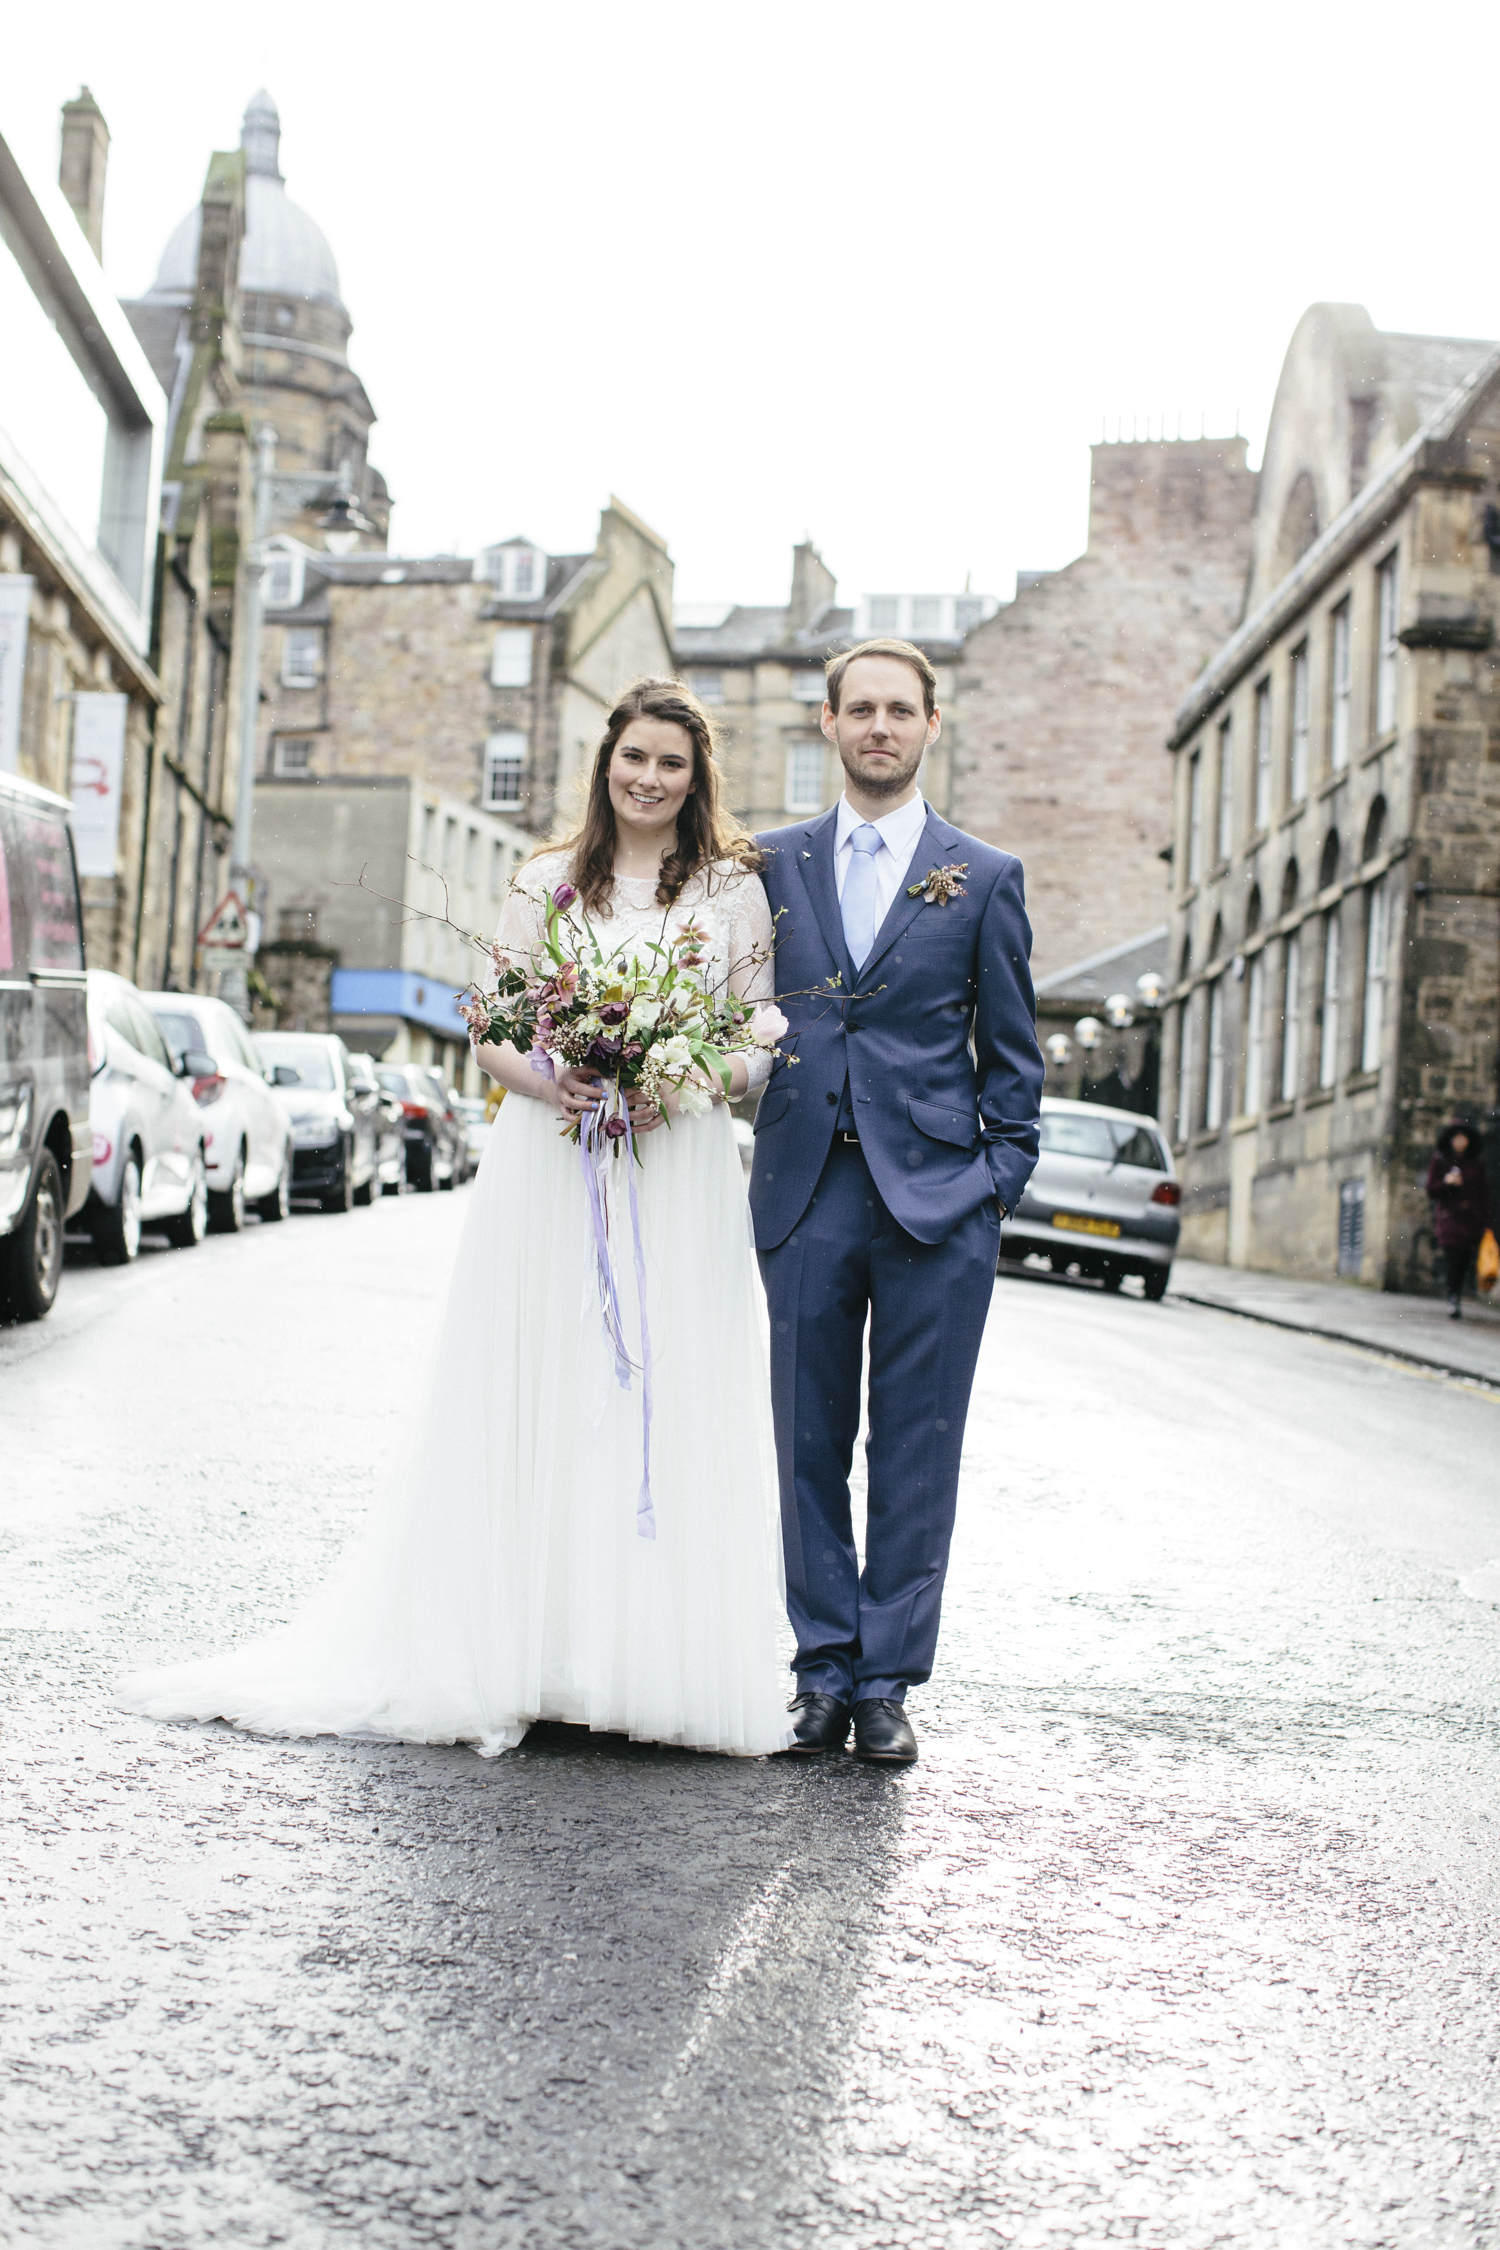 Quirky Wedding Photography Edinburgh Dovecot Studios 090.jpg